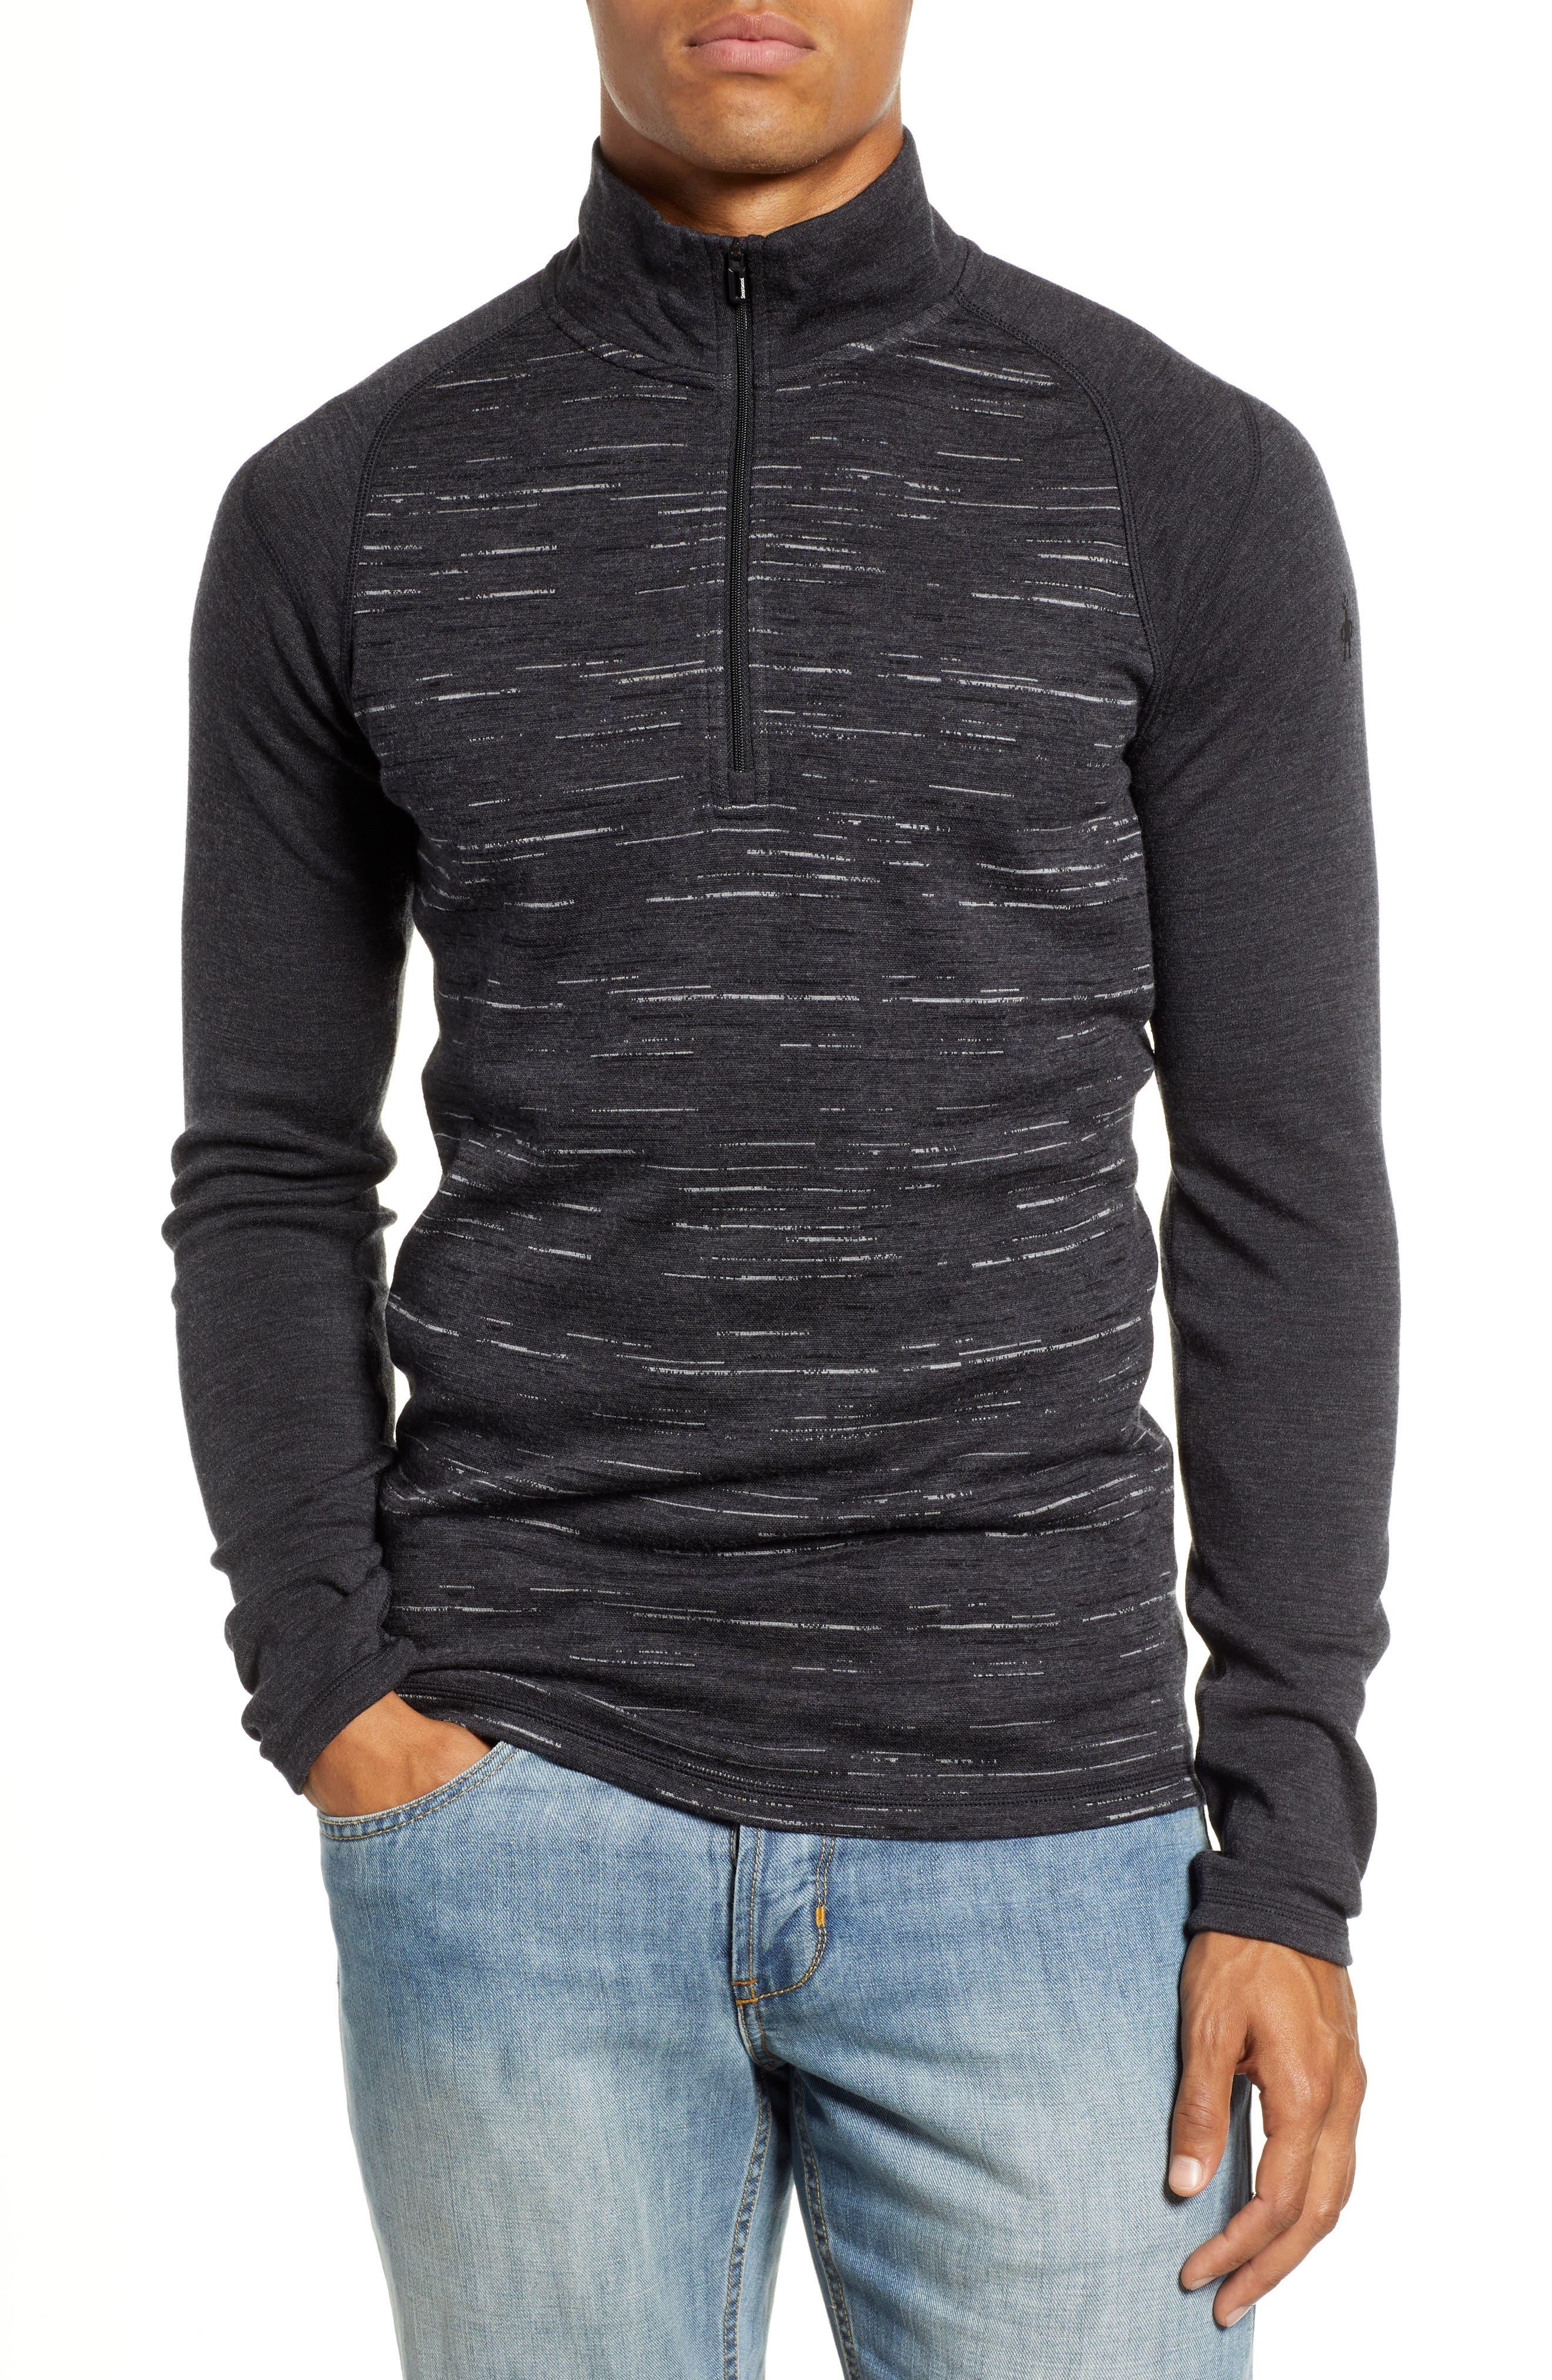 SMARTWOOL,                             Merino 250 Base Layer Pattern Quarter Zip Pullover,                             Main thumbnail 1, color,                             CHARCOAL/ BLACK